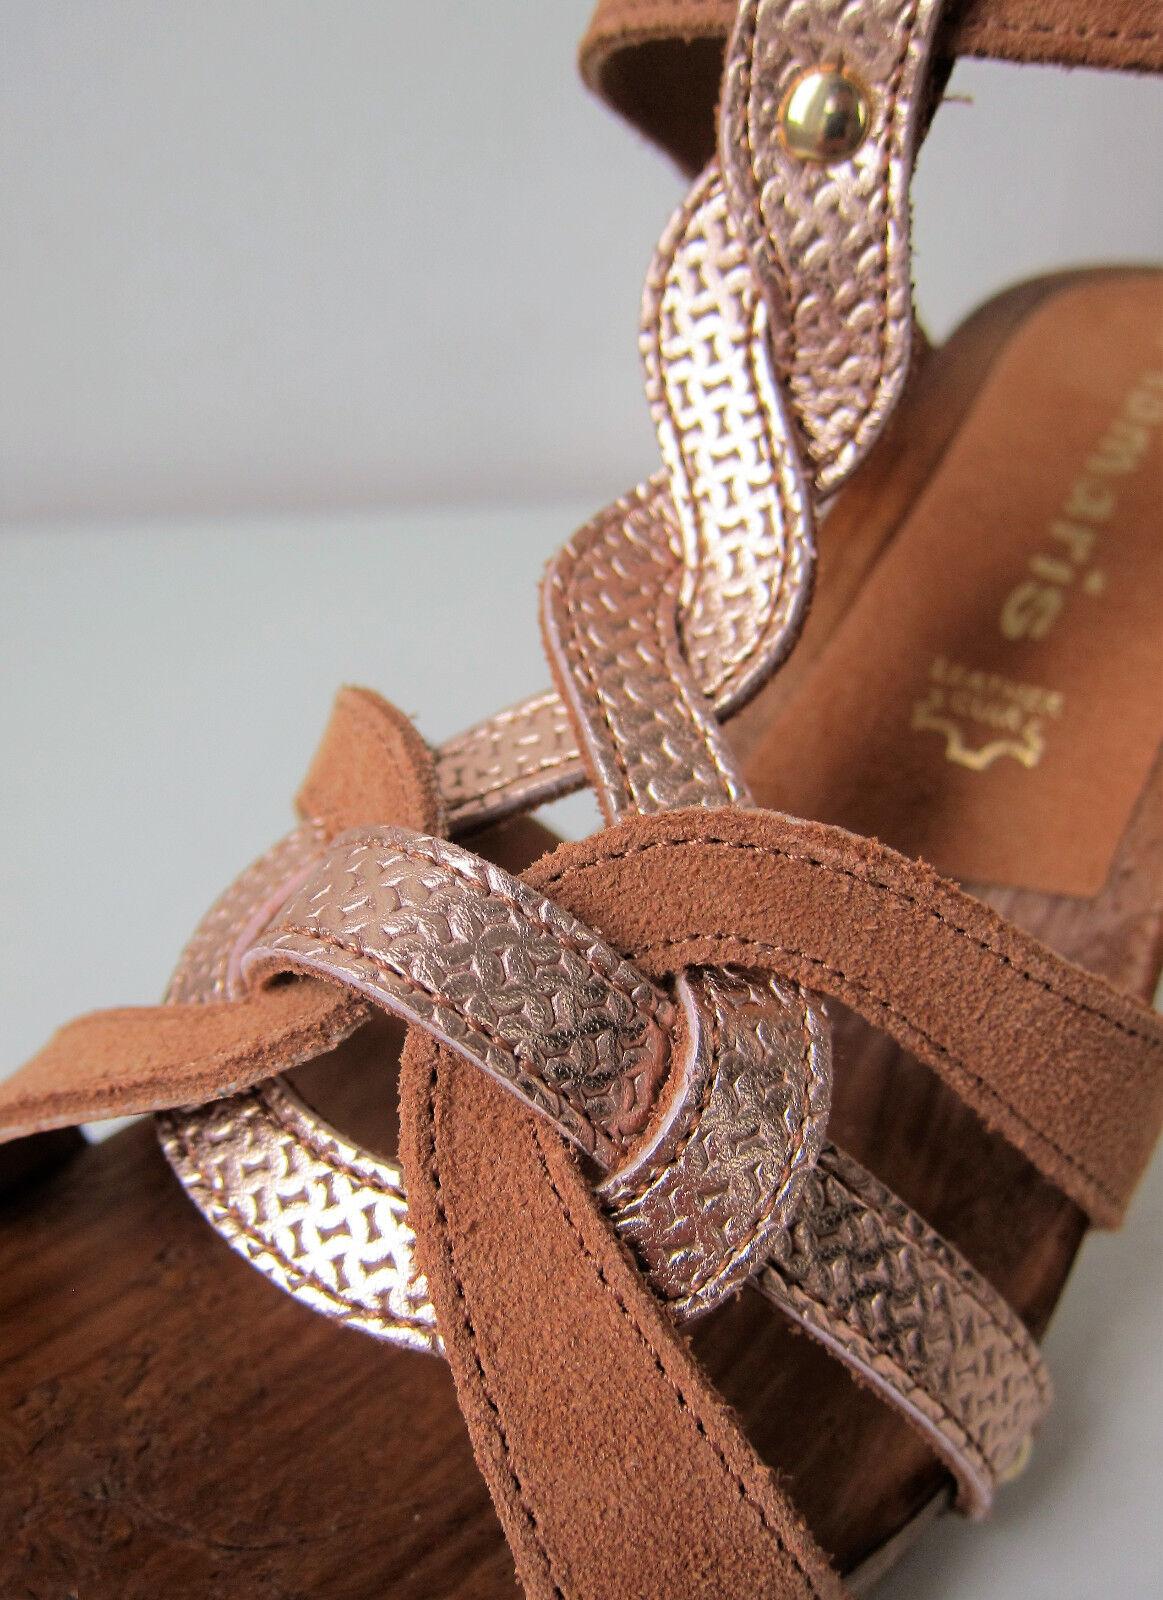 Tamaris Sandale Sandalette braun cuoio Gr. 36 cuoio braun rose gold rosegold Glitzer Plateau babbcc